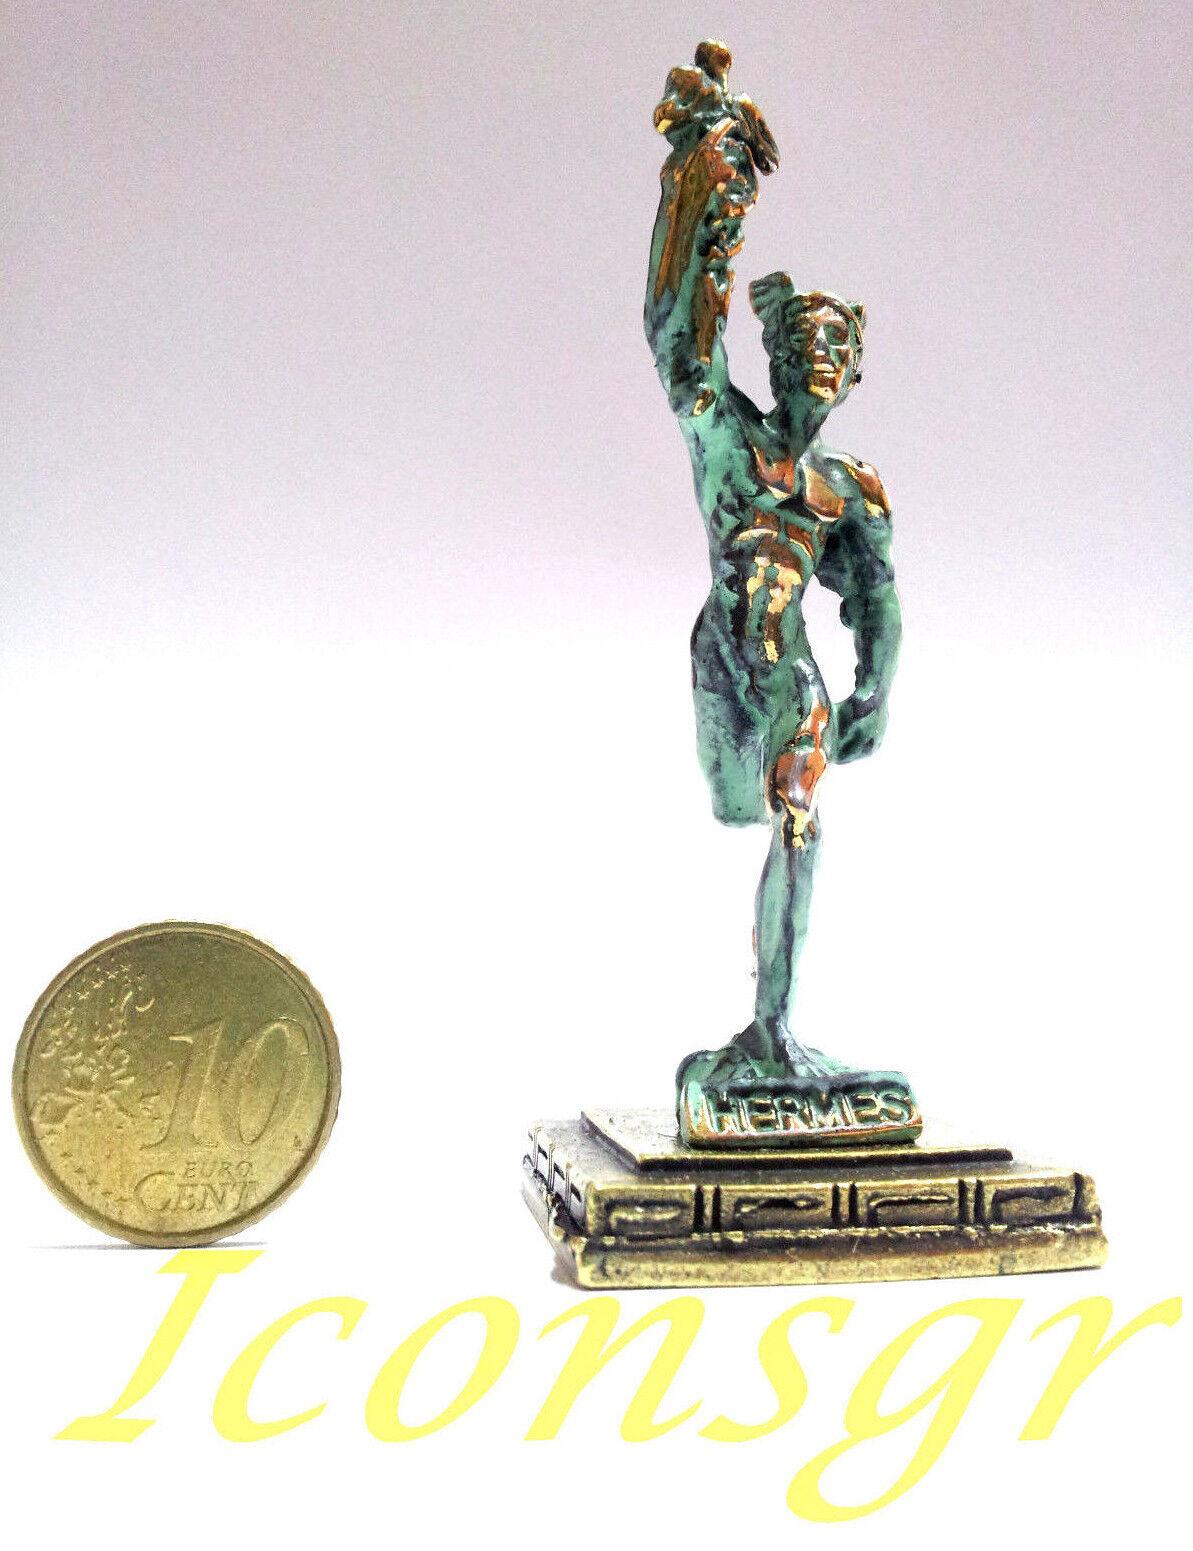 Statue Hermes Messenger God Olympian God Ancient Miniature Sculpture Zamac